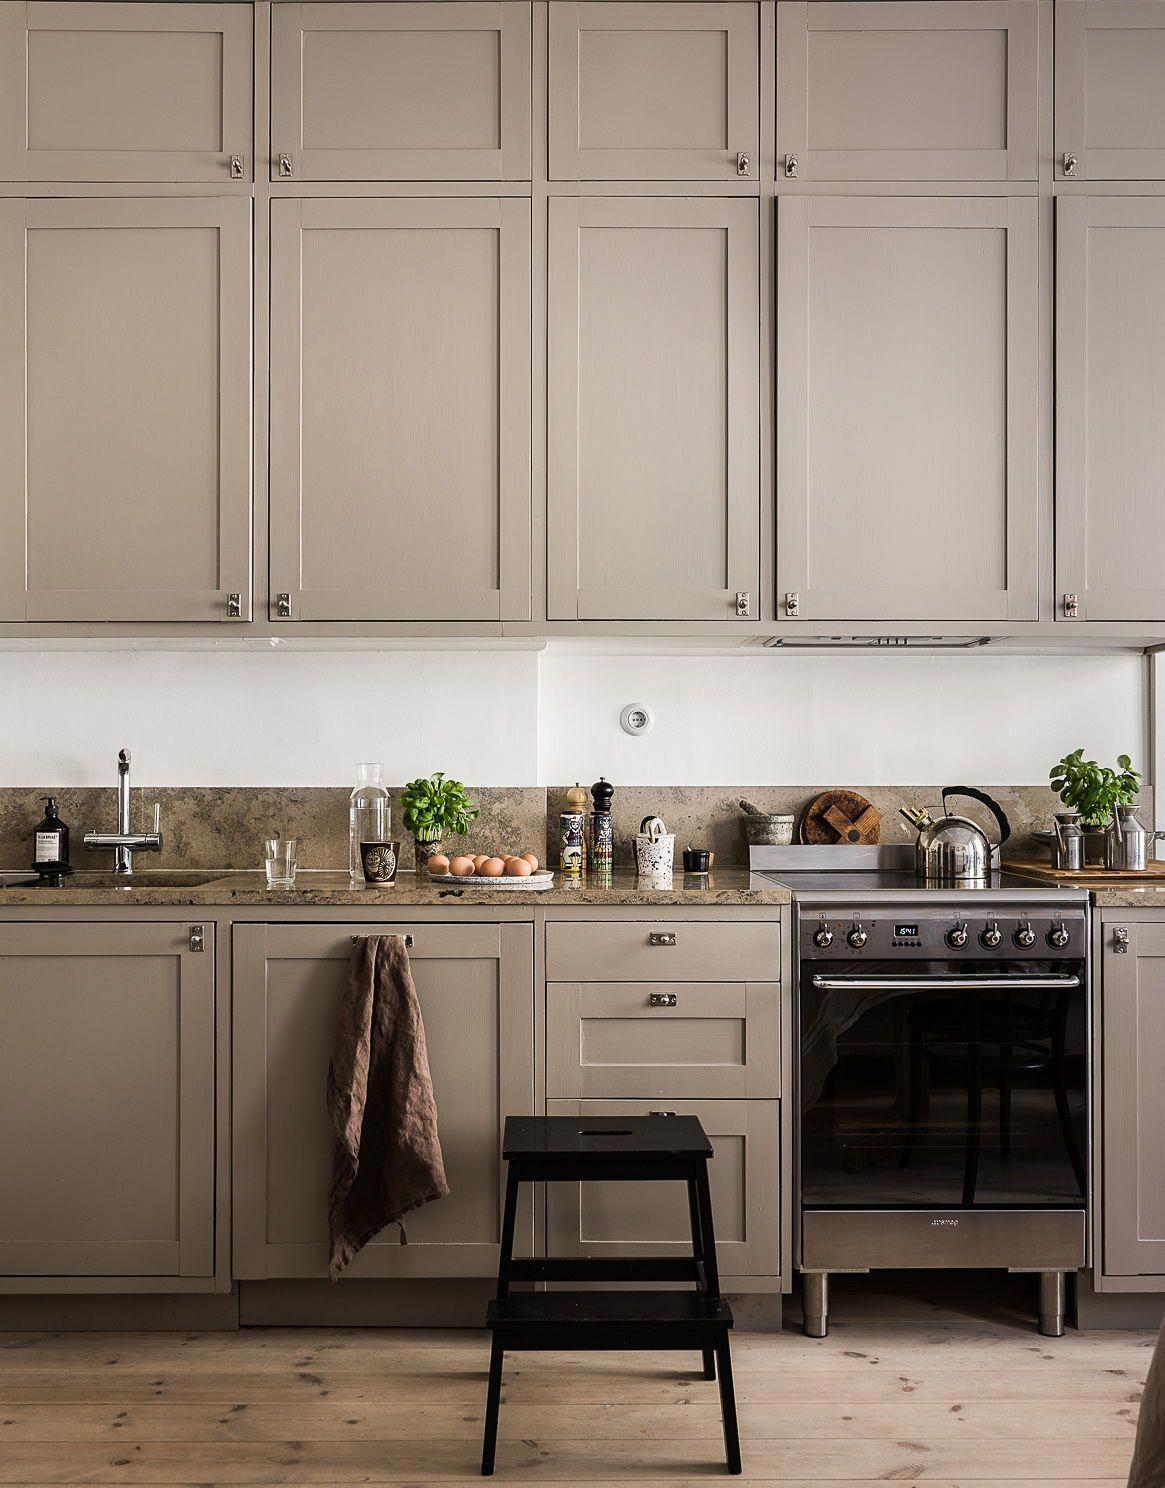 Biege Kitchen Via Coco Lapine Design Blog Tuscandesign Beige Kitchen Kitchen Interior Kitchen Design